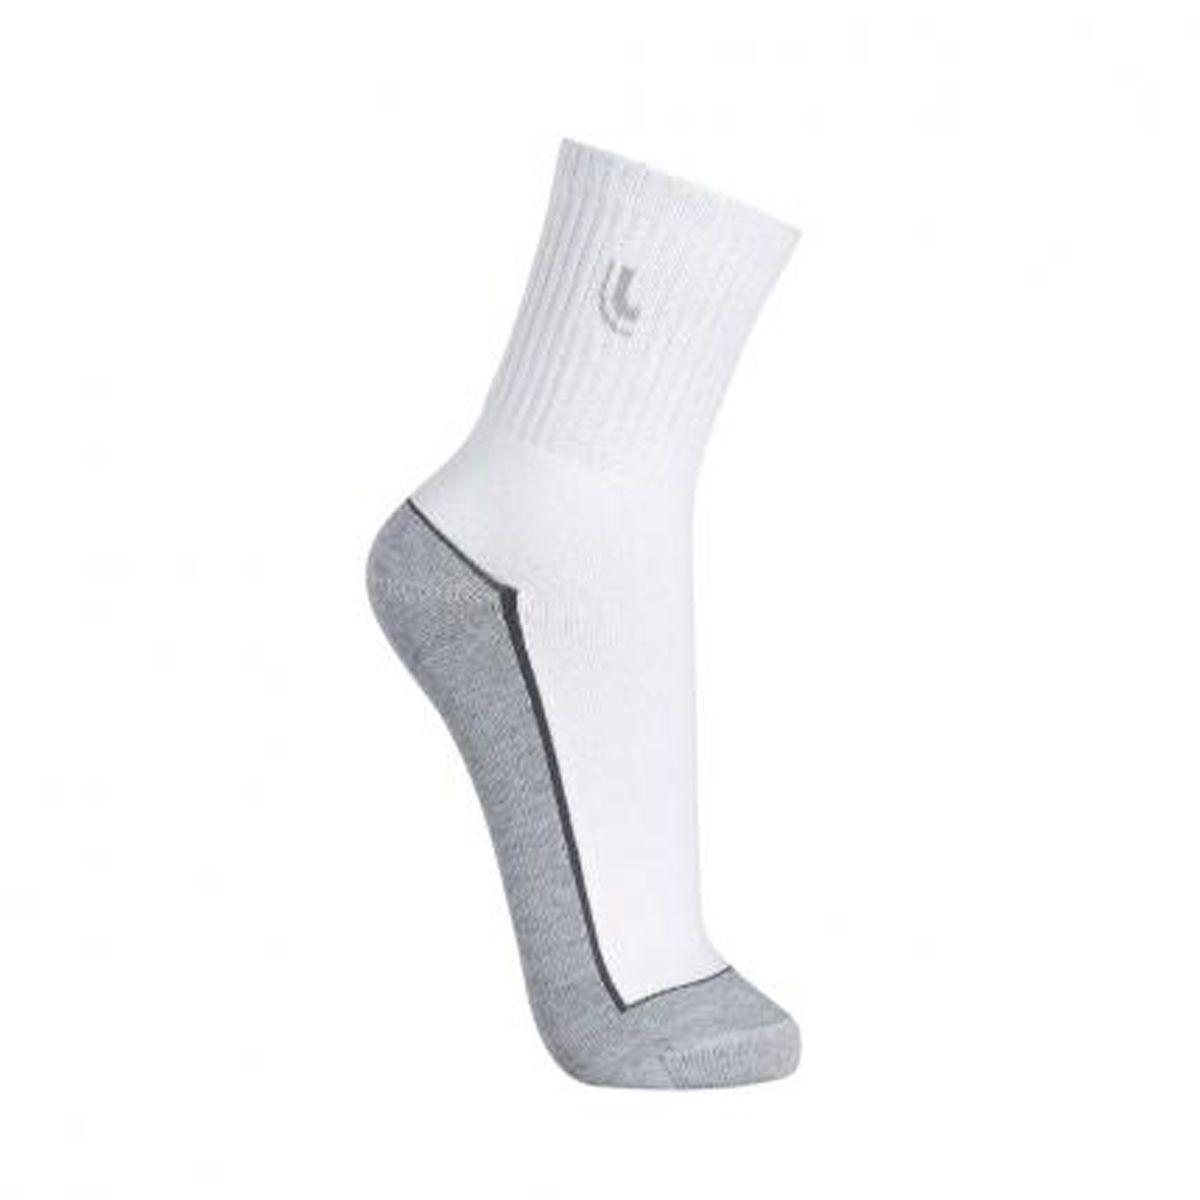 Kit 3 meia masculina cano médio esportiva algodão Lupo -